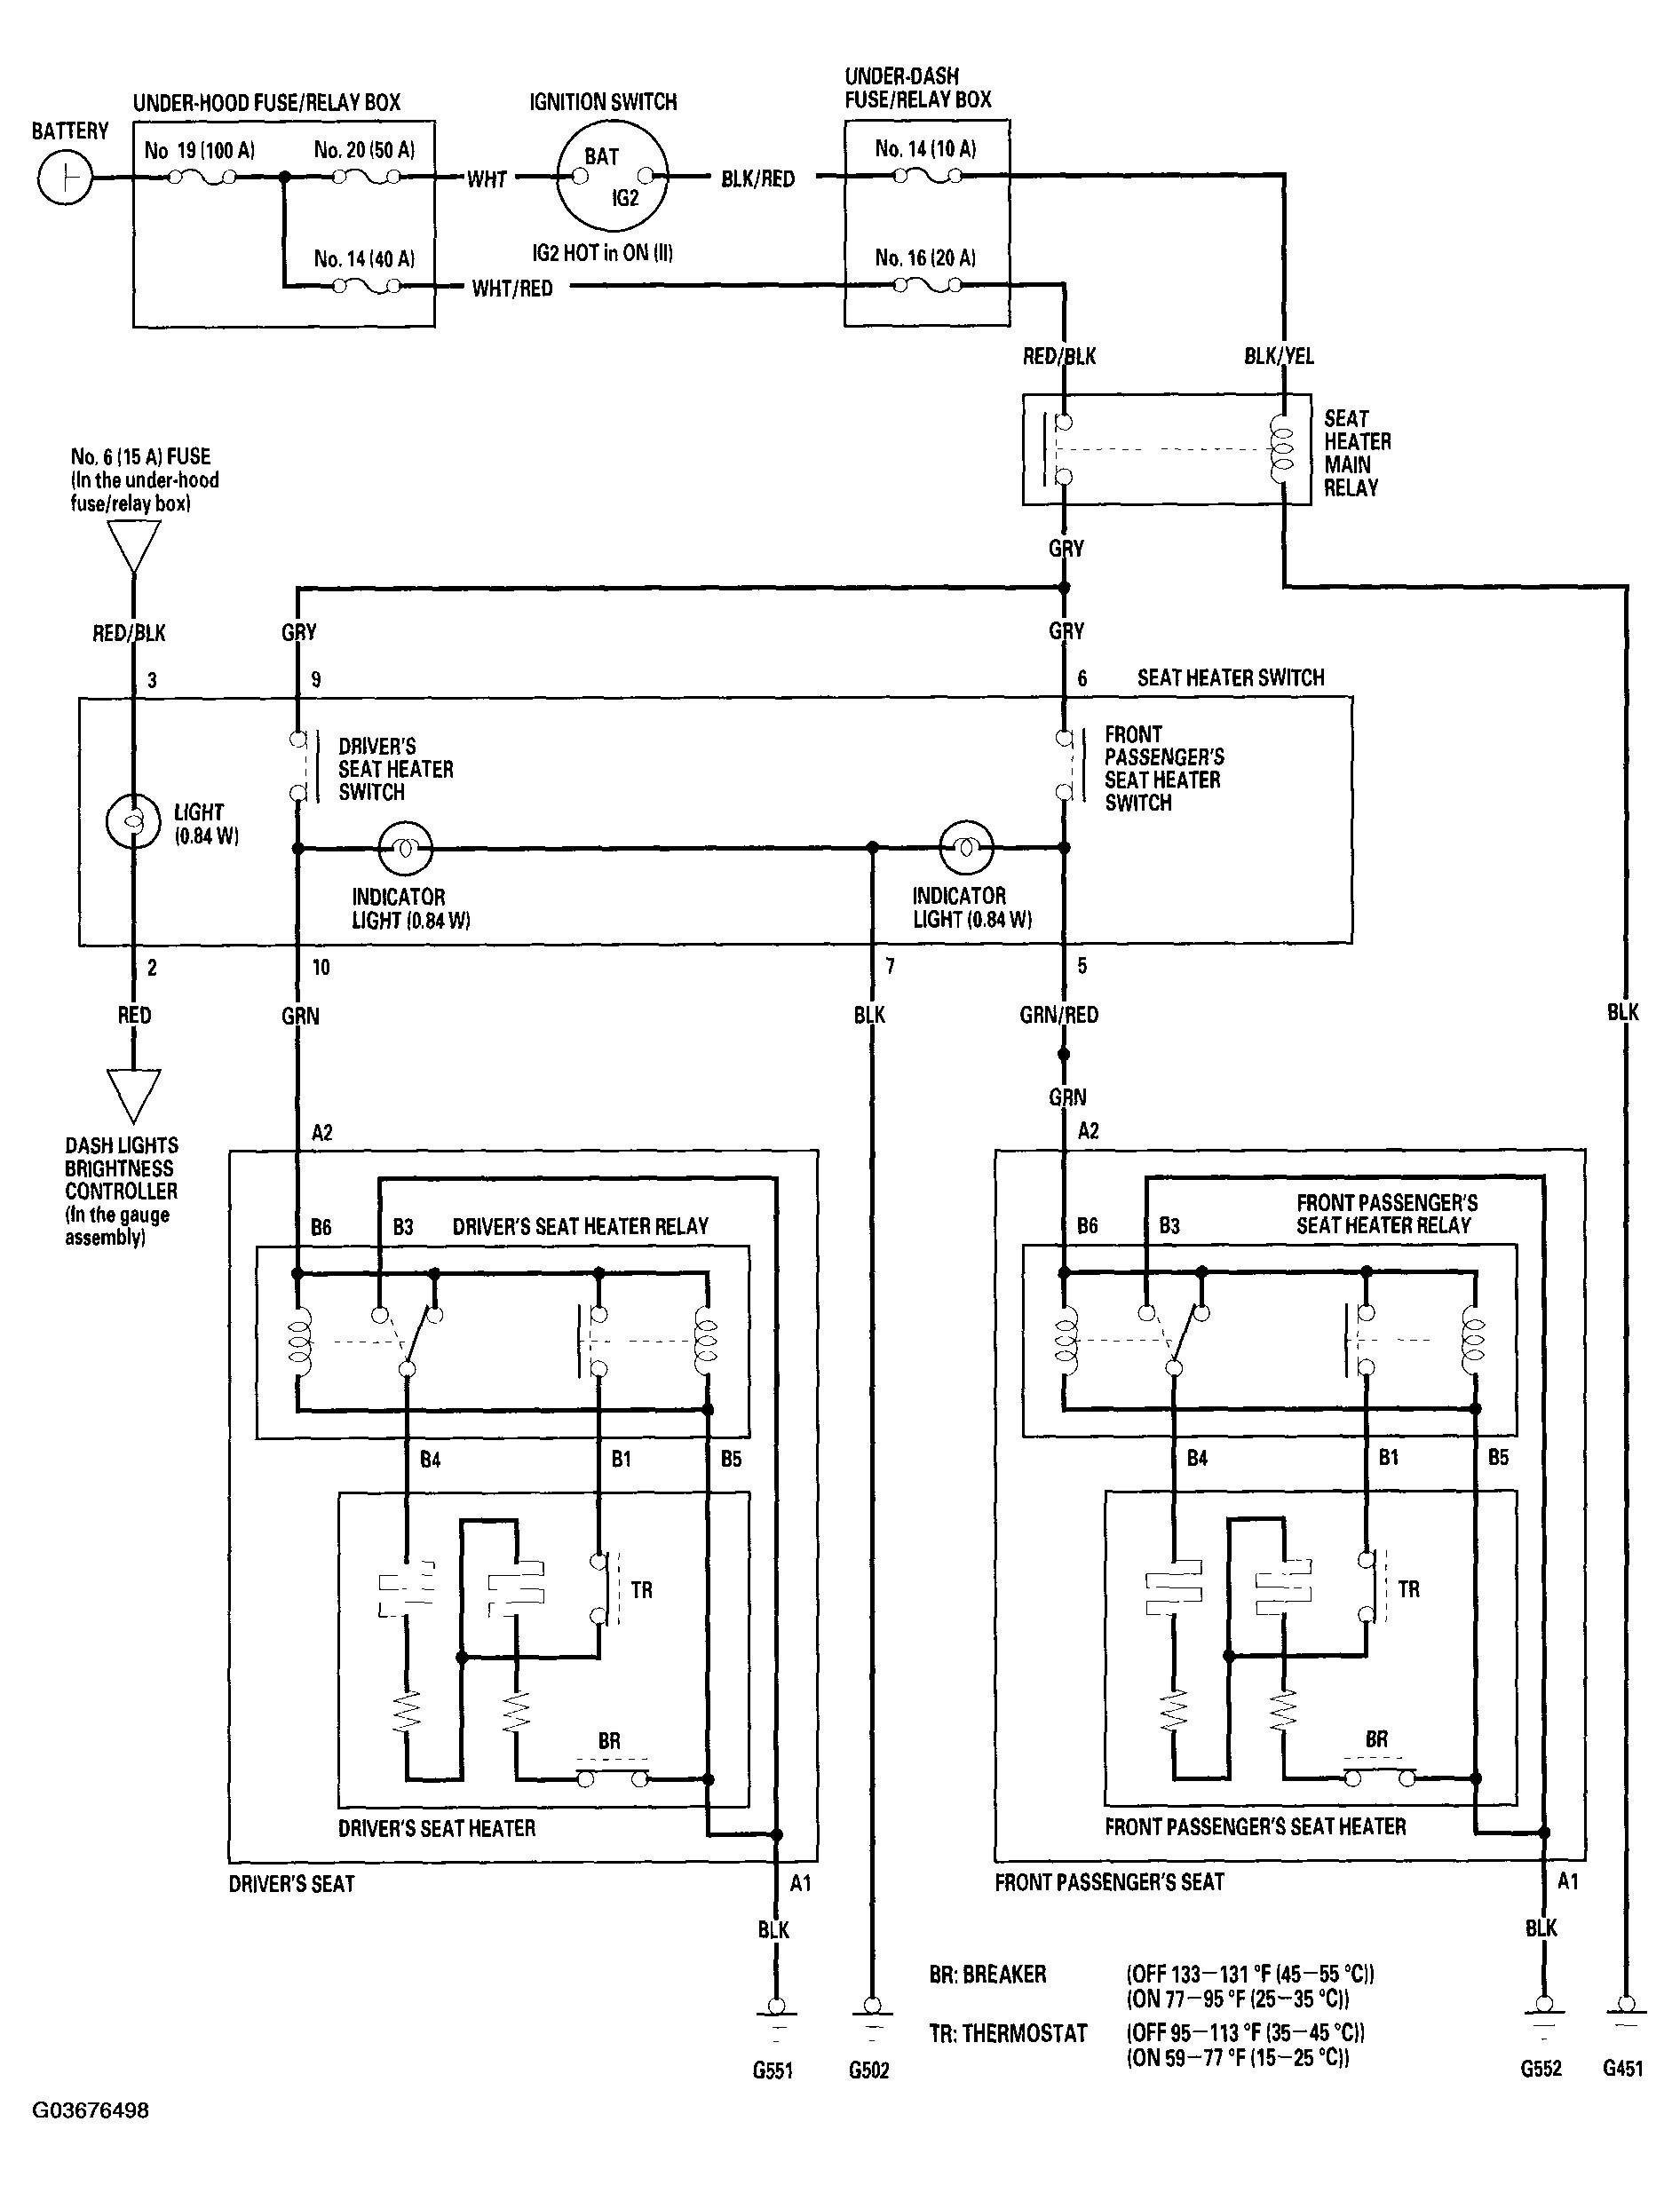 1995 Honda Civic Engine Diagram Best 2006 Honda Civic Relay Diagram • Electrical Outlet Symbol 2018 Of 1995 Honda Civic Engine Diagram